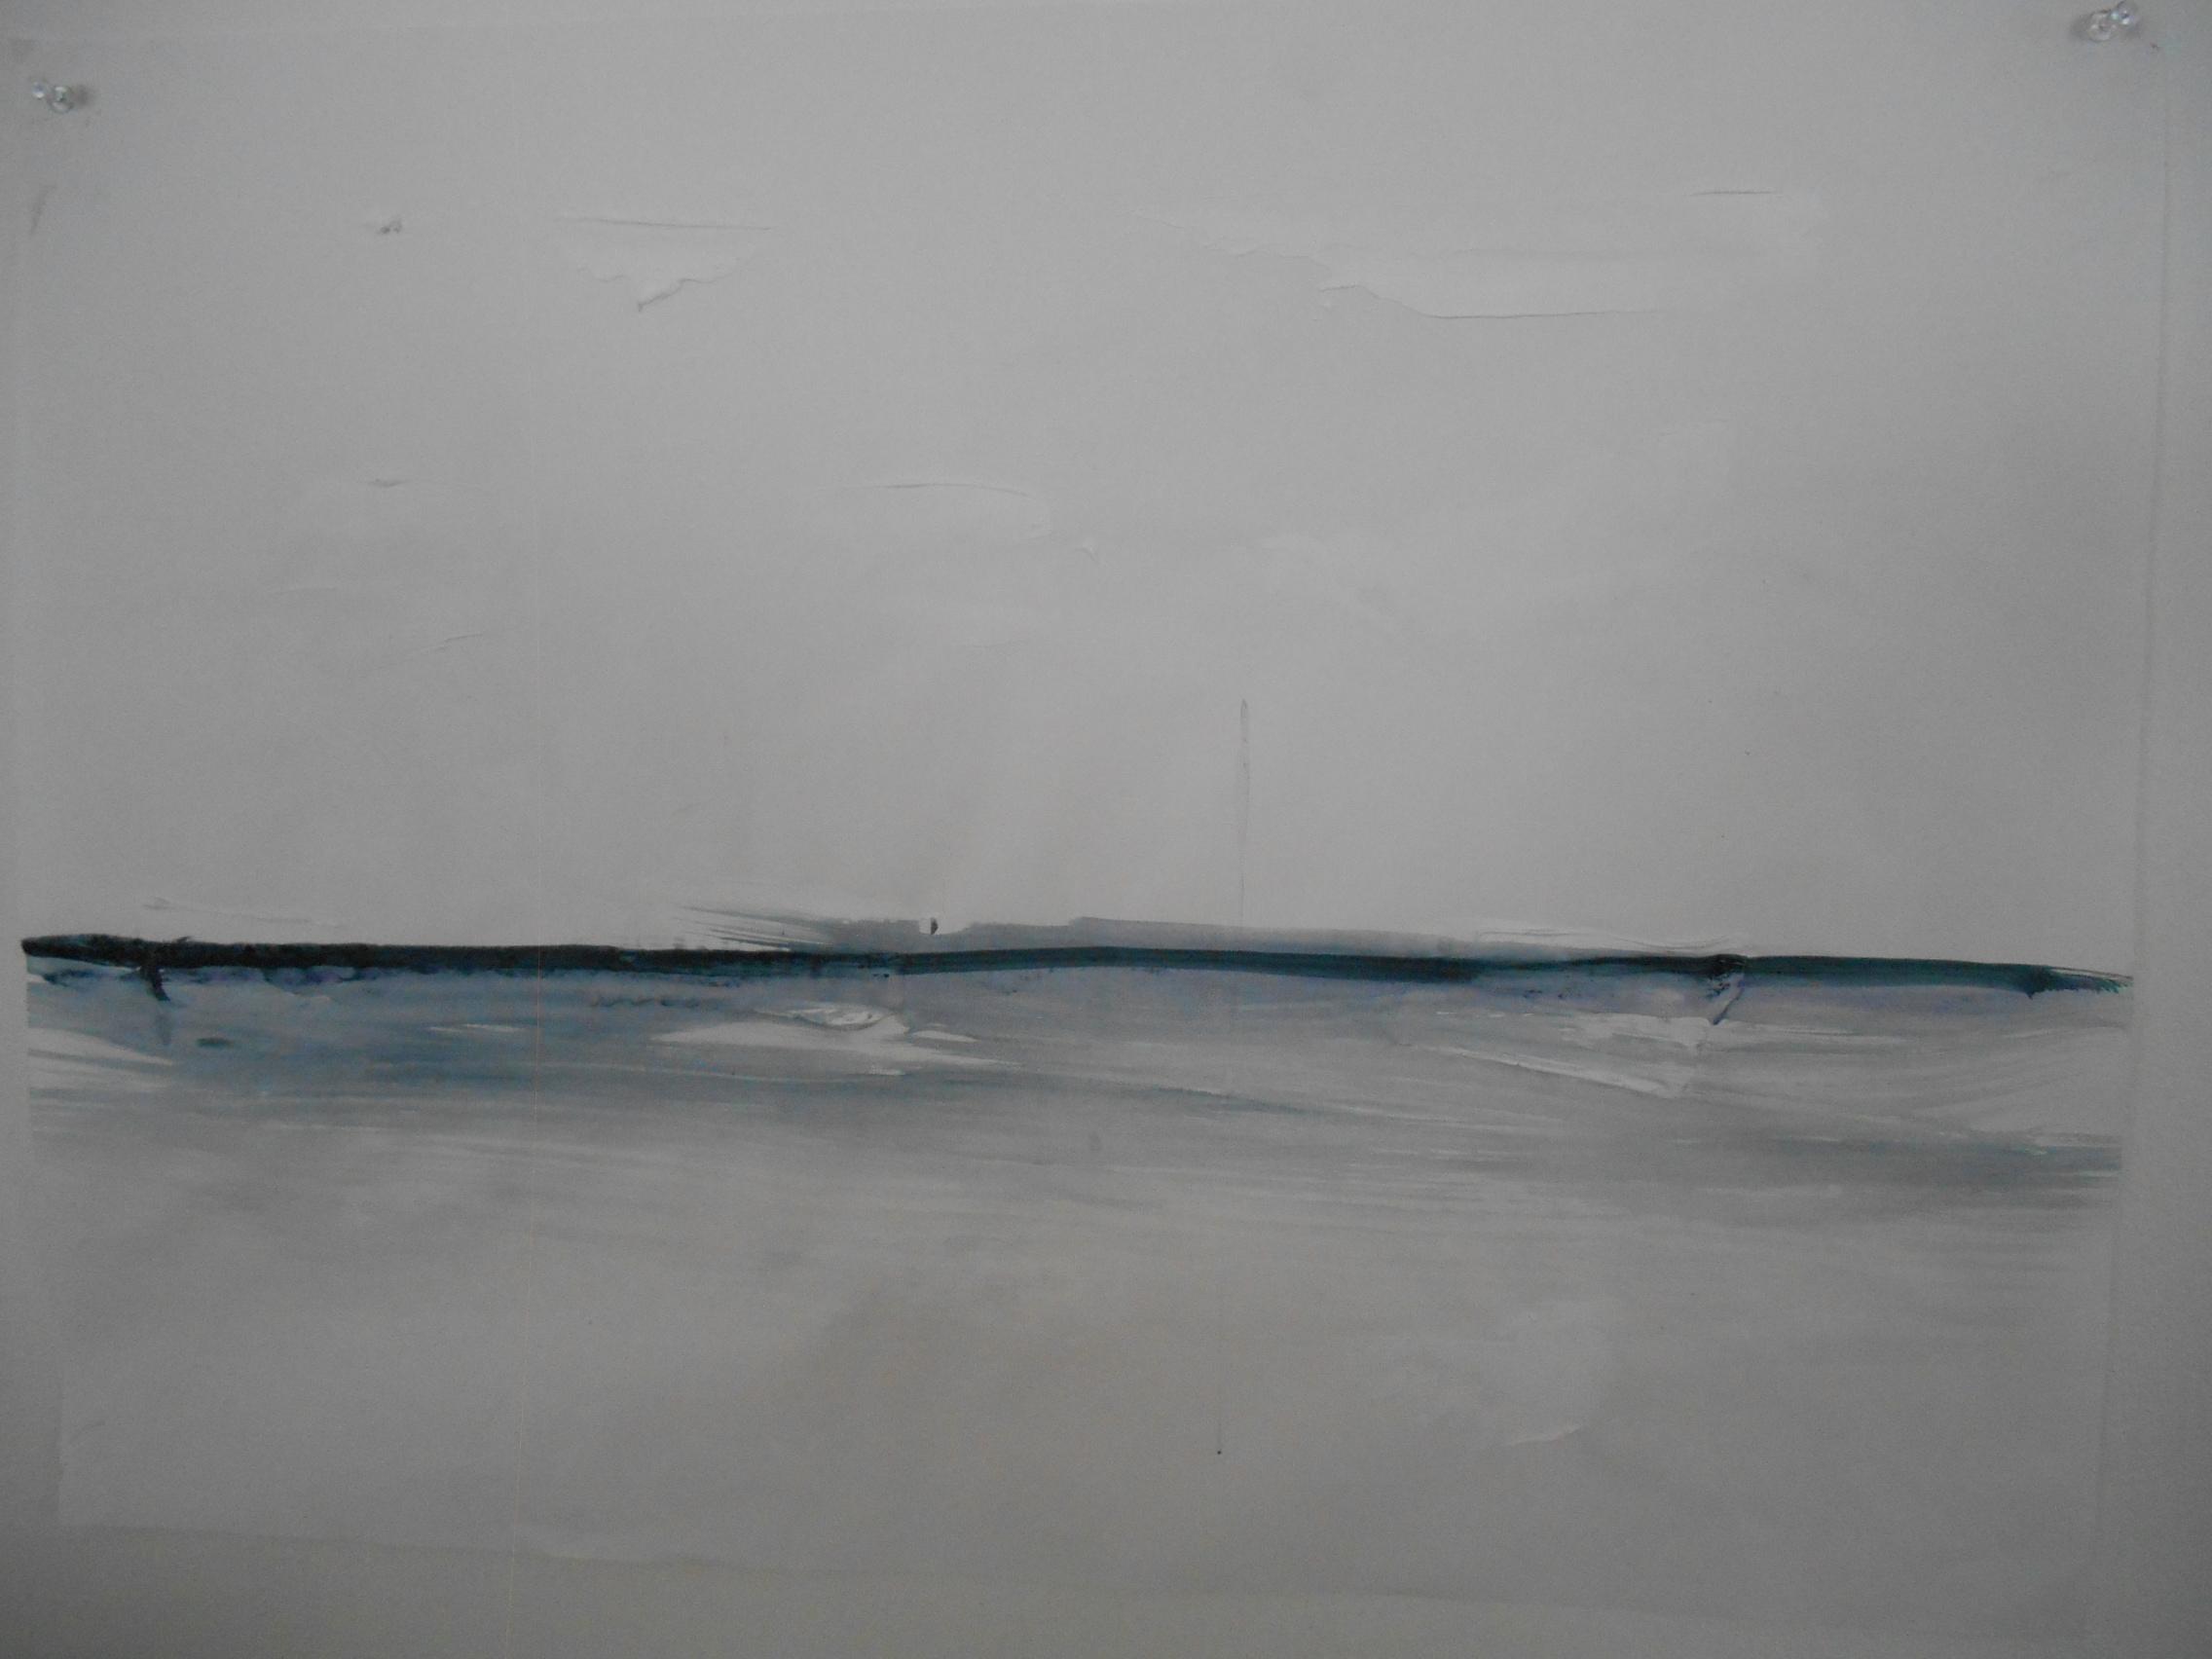 Ice on the Severn